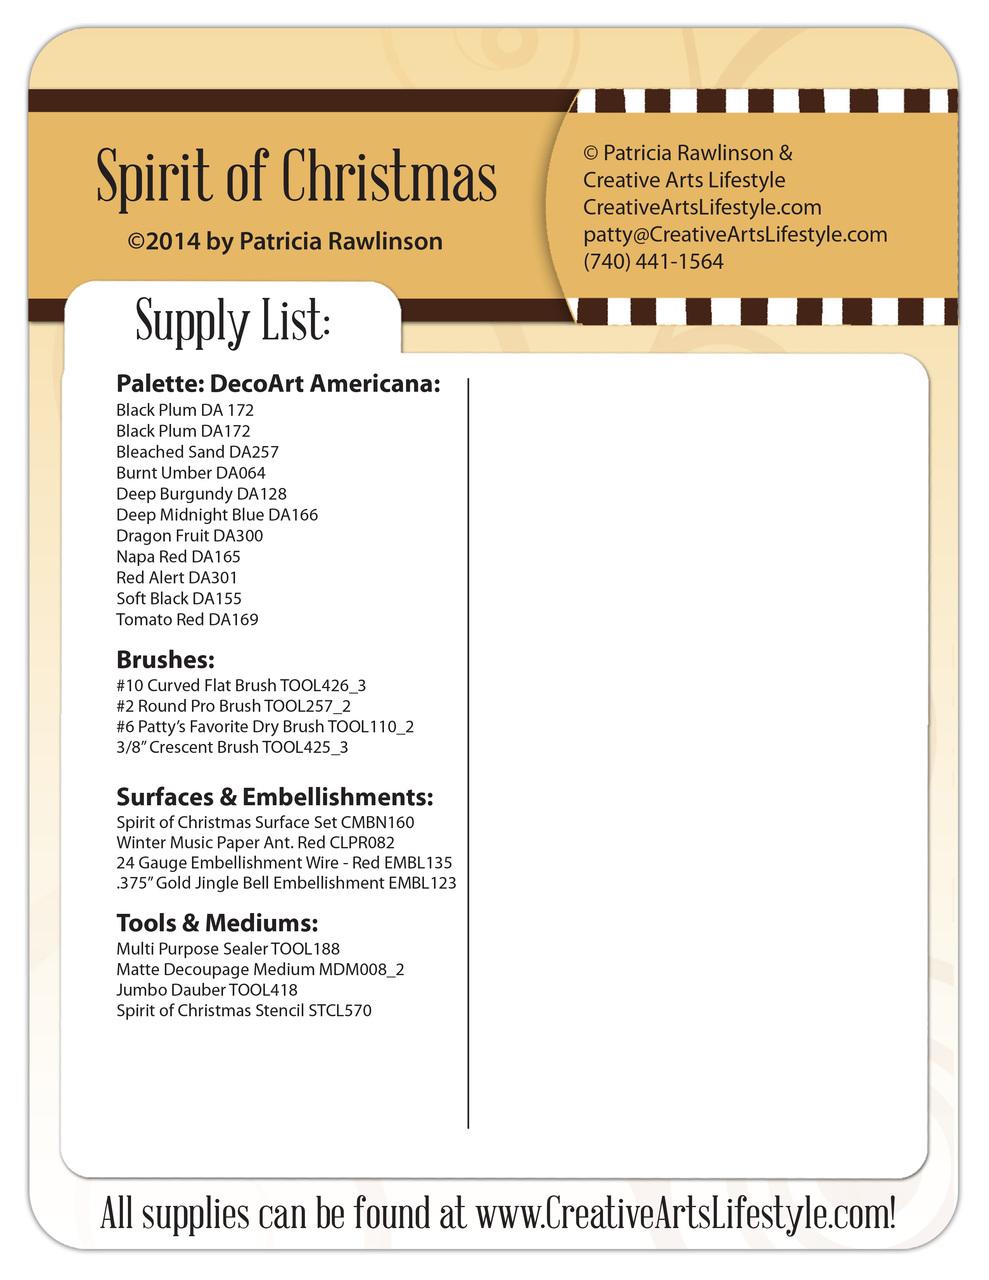 Spirit of Christmas DVD - Patricia Rawlinson